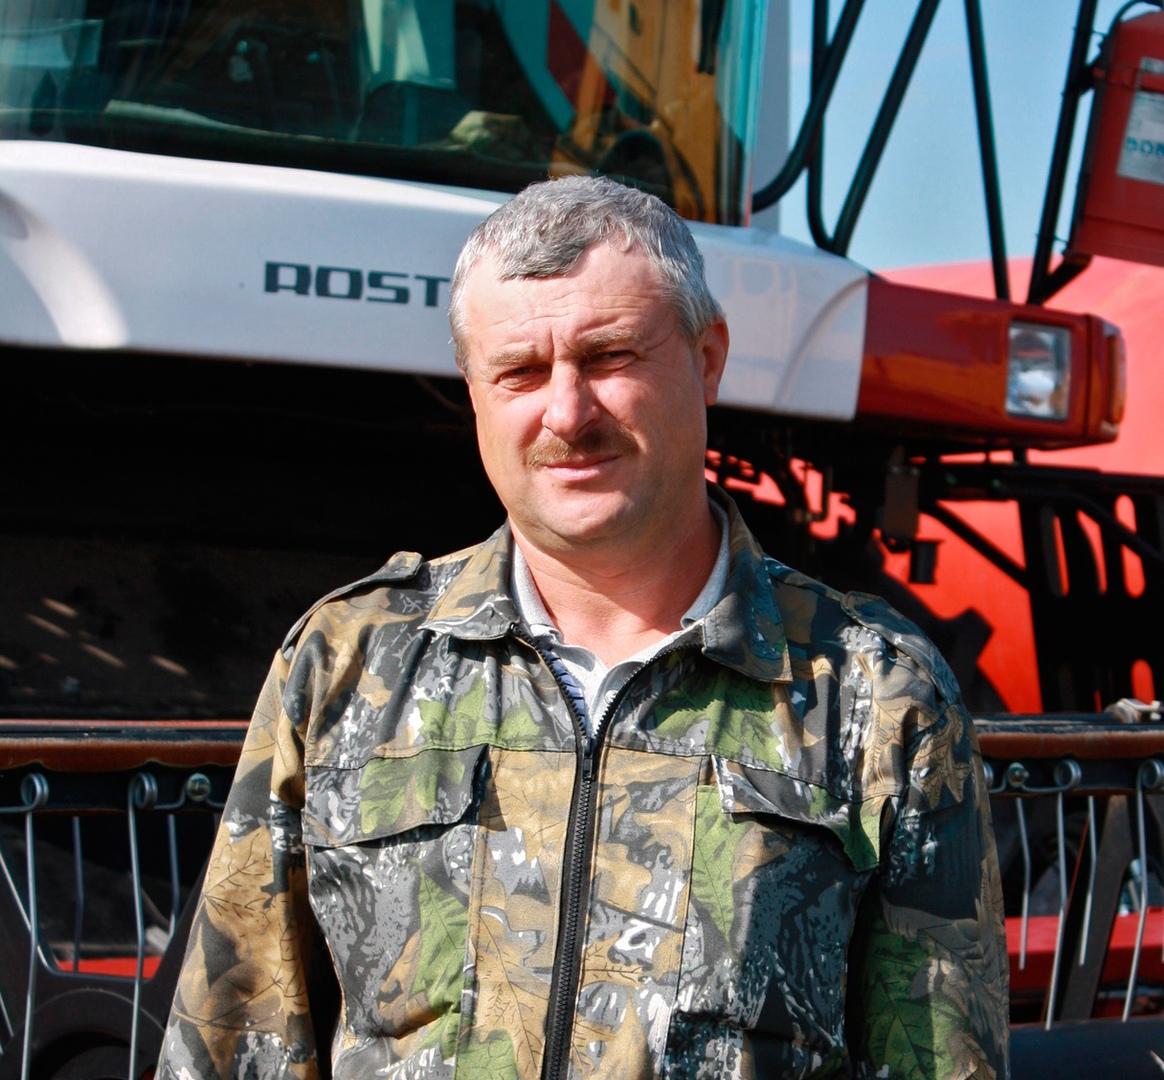 Медведев наградил орденом курского тракториста